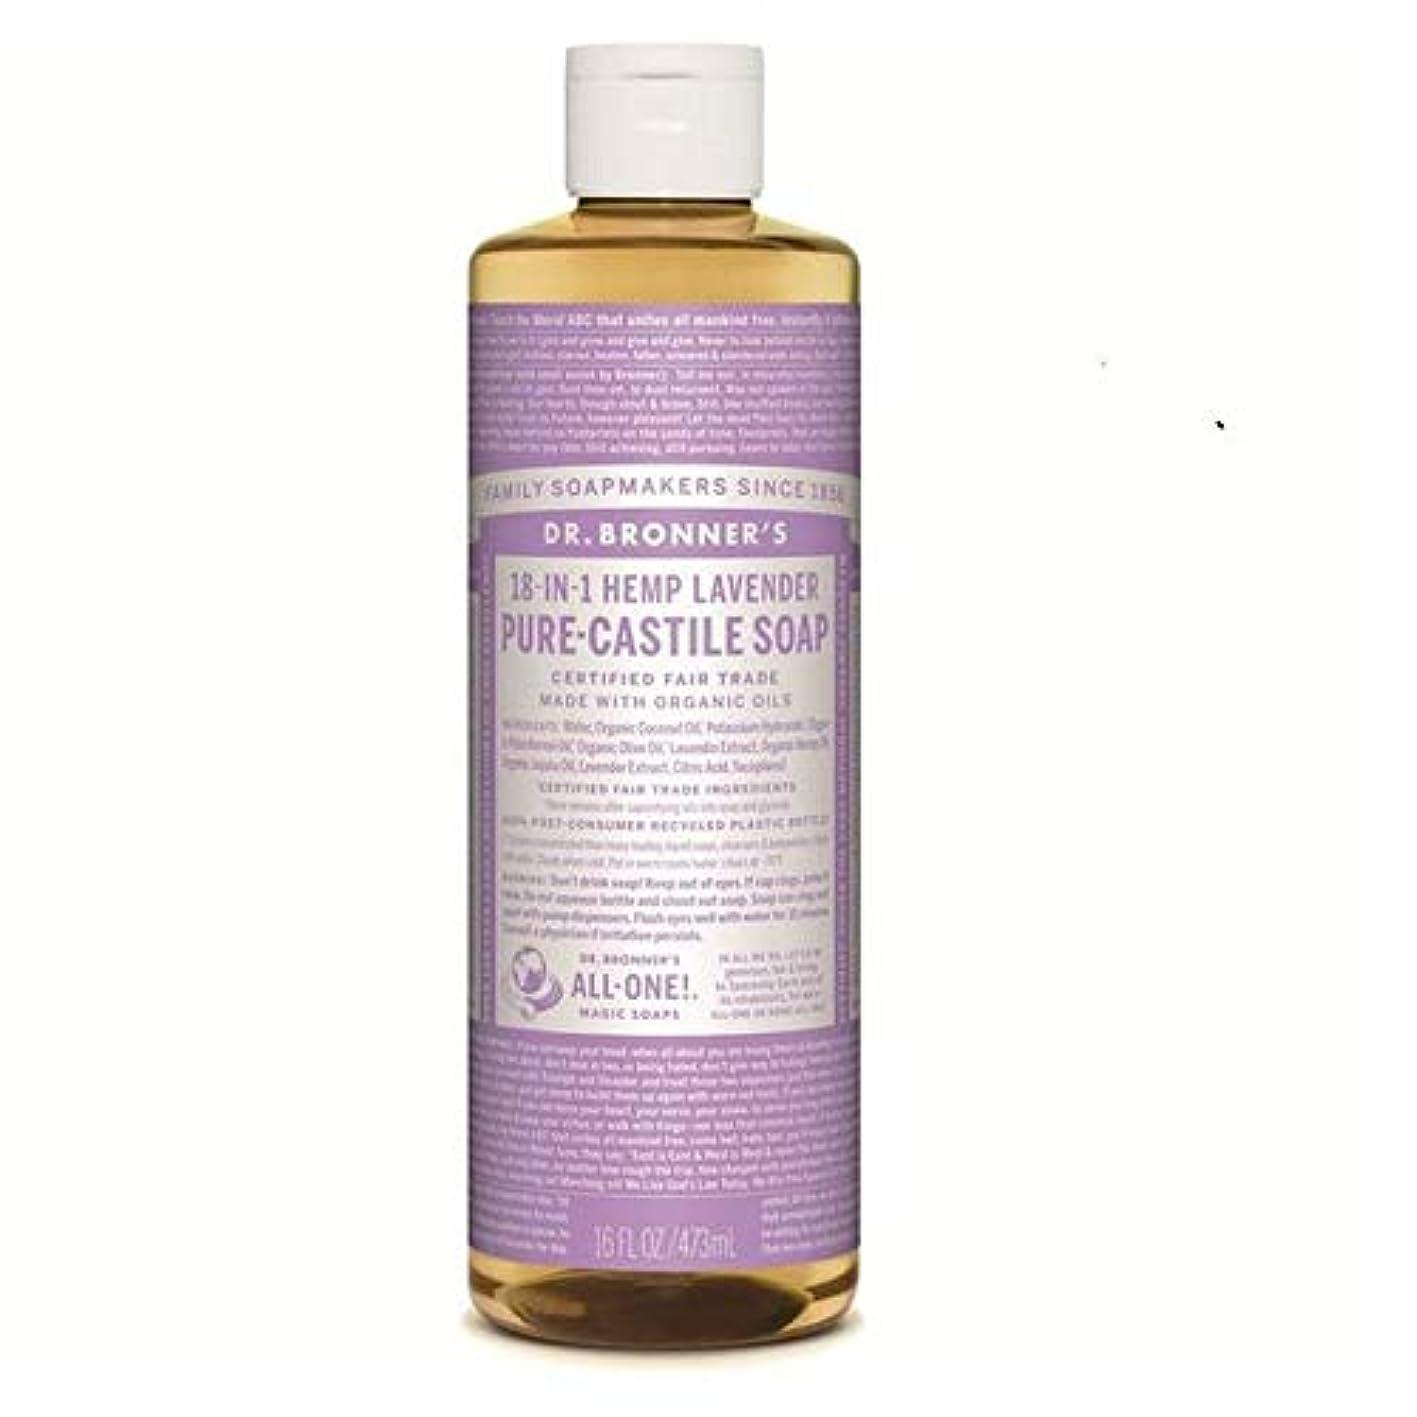 [Dr Bronner] Dr。ブロナーズオーガニックラベンダーカスティーリャ液体石鹸473ミリリットル - Dr. Bronner's Organic Lavender Castile Liquid Soap 473ml...